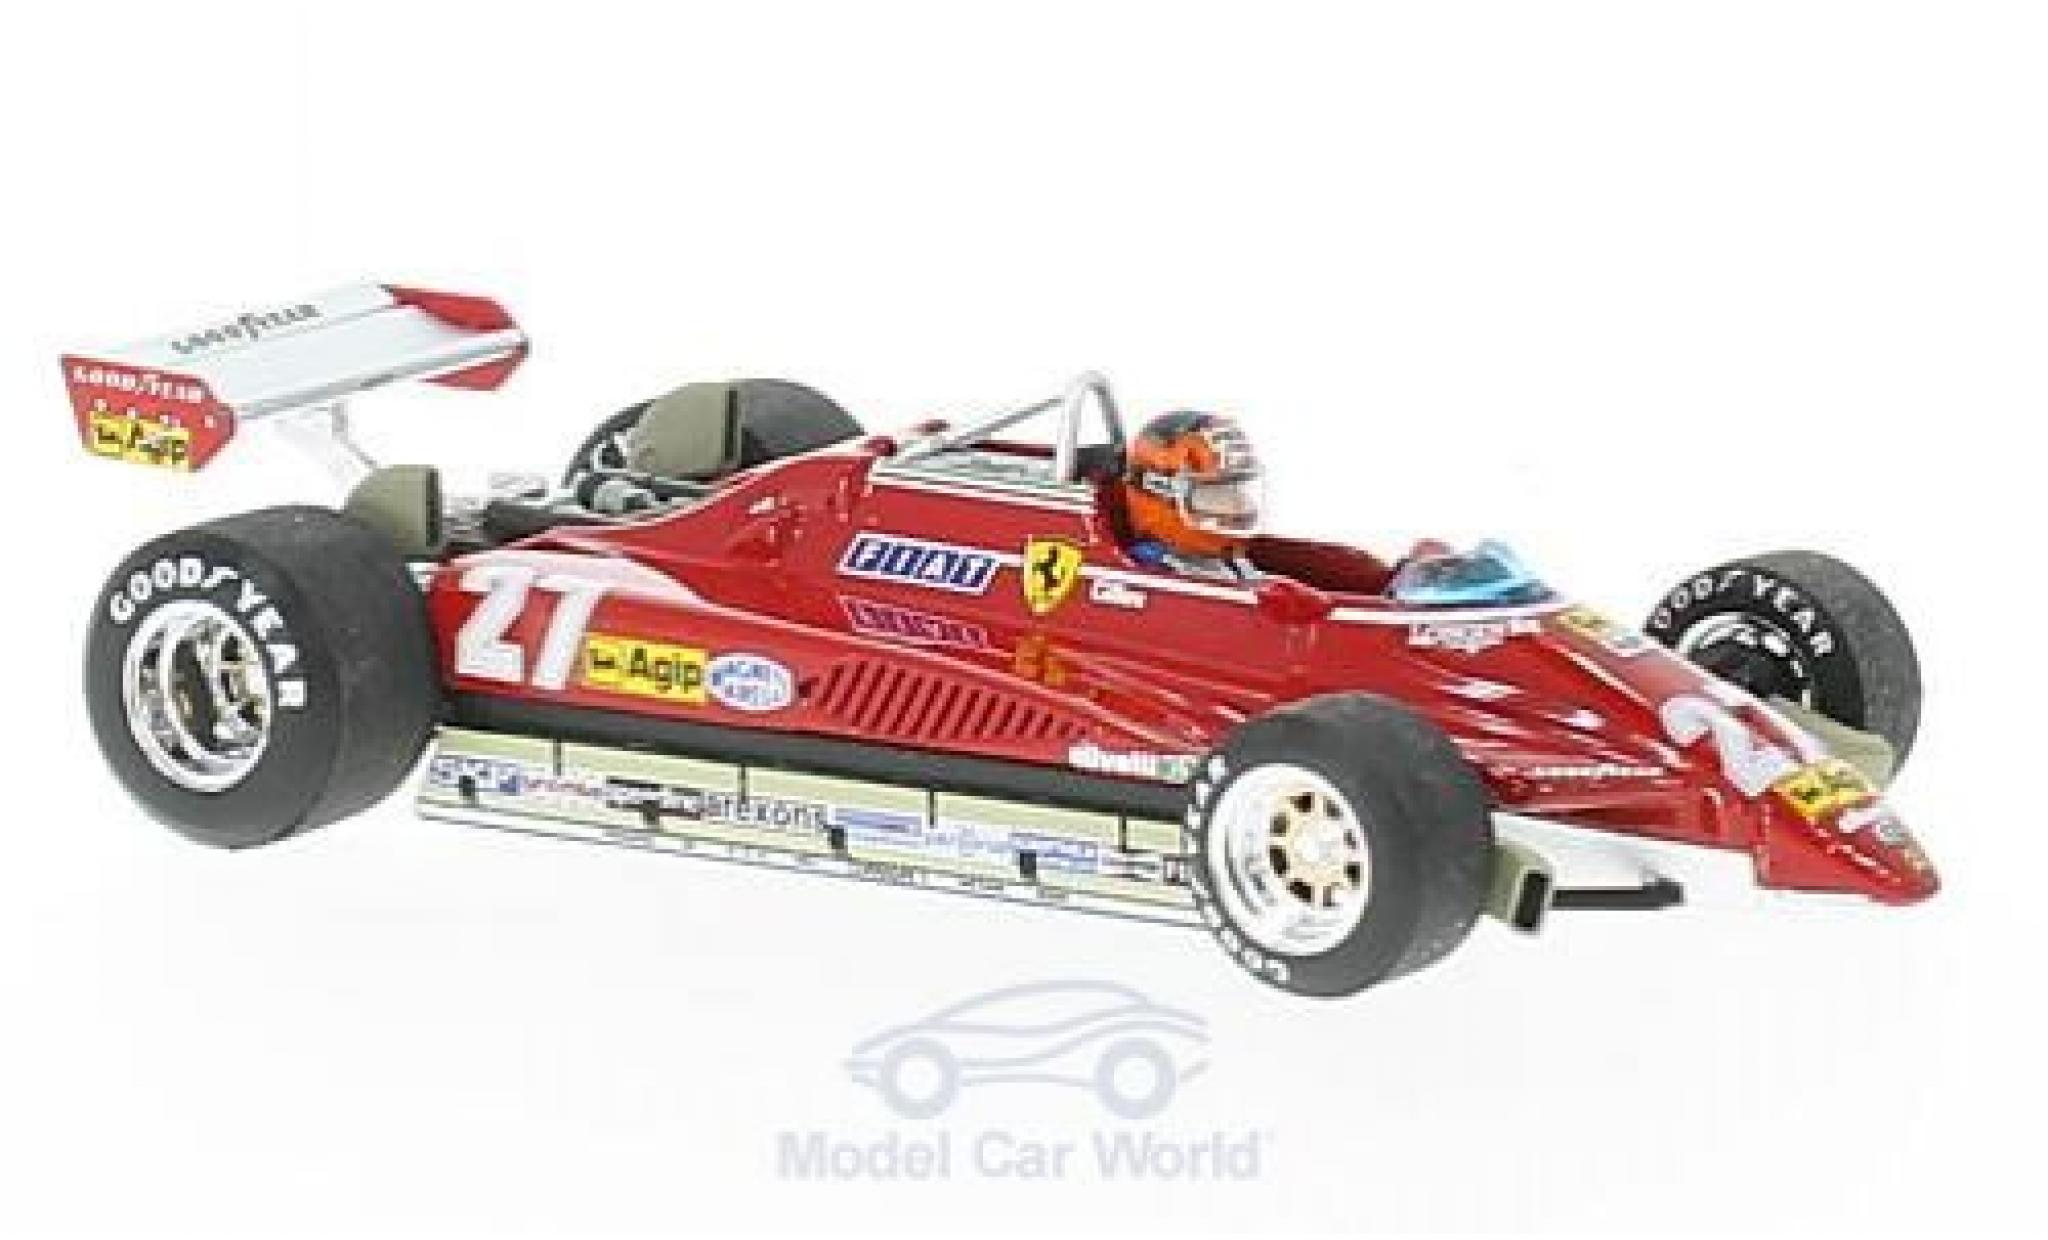 Ferrari 126 1982 1/43 Brumm C2 turbo No.27 Formel 1 GP Brasilien mit Fahrerfigur G.Villeneuve